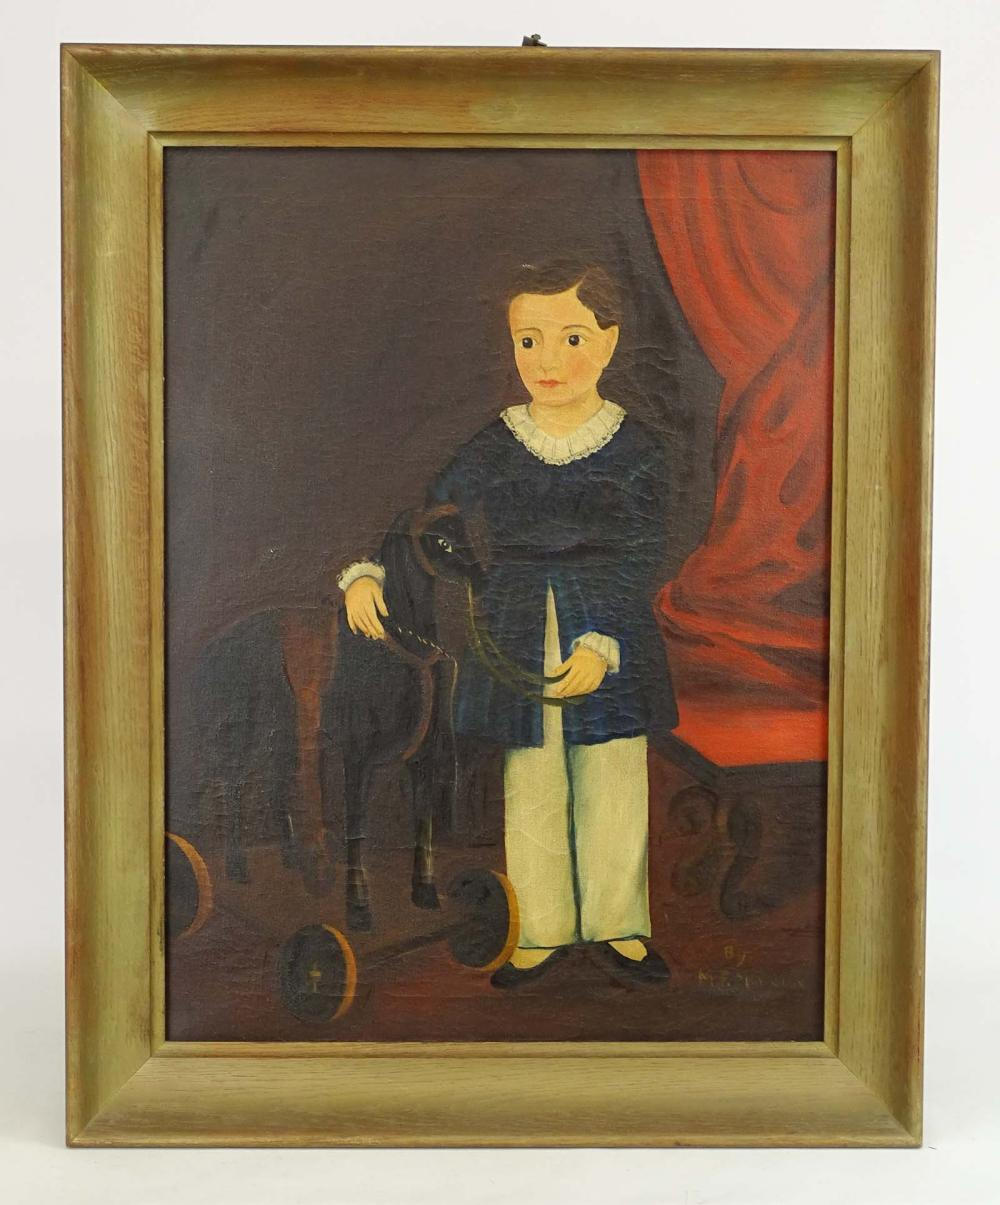 Folk Art Portrait Of Child With Rocking Horse